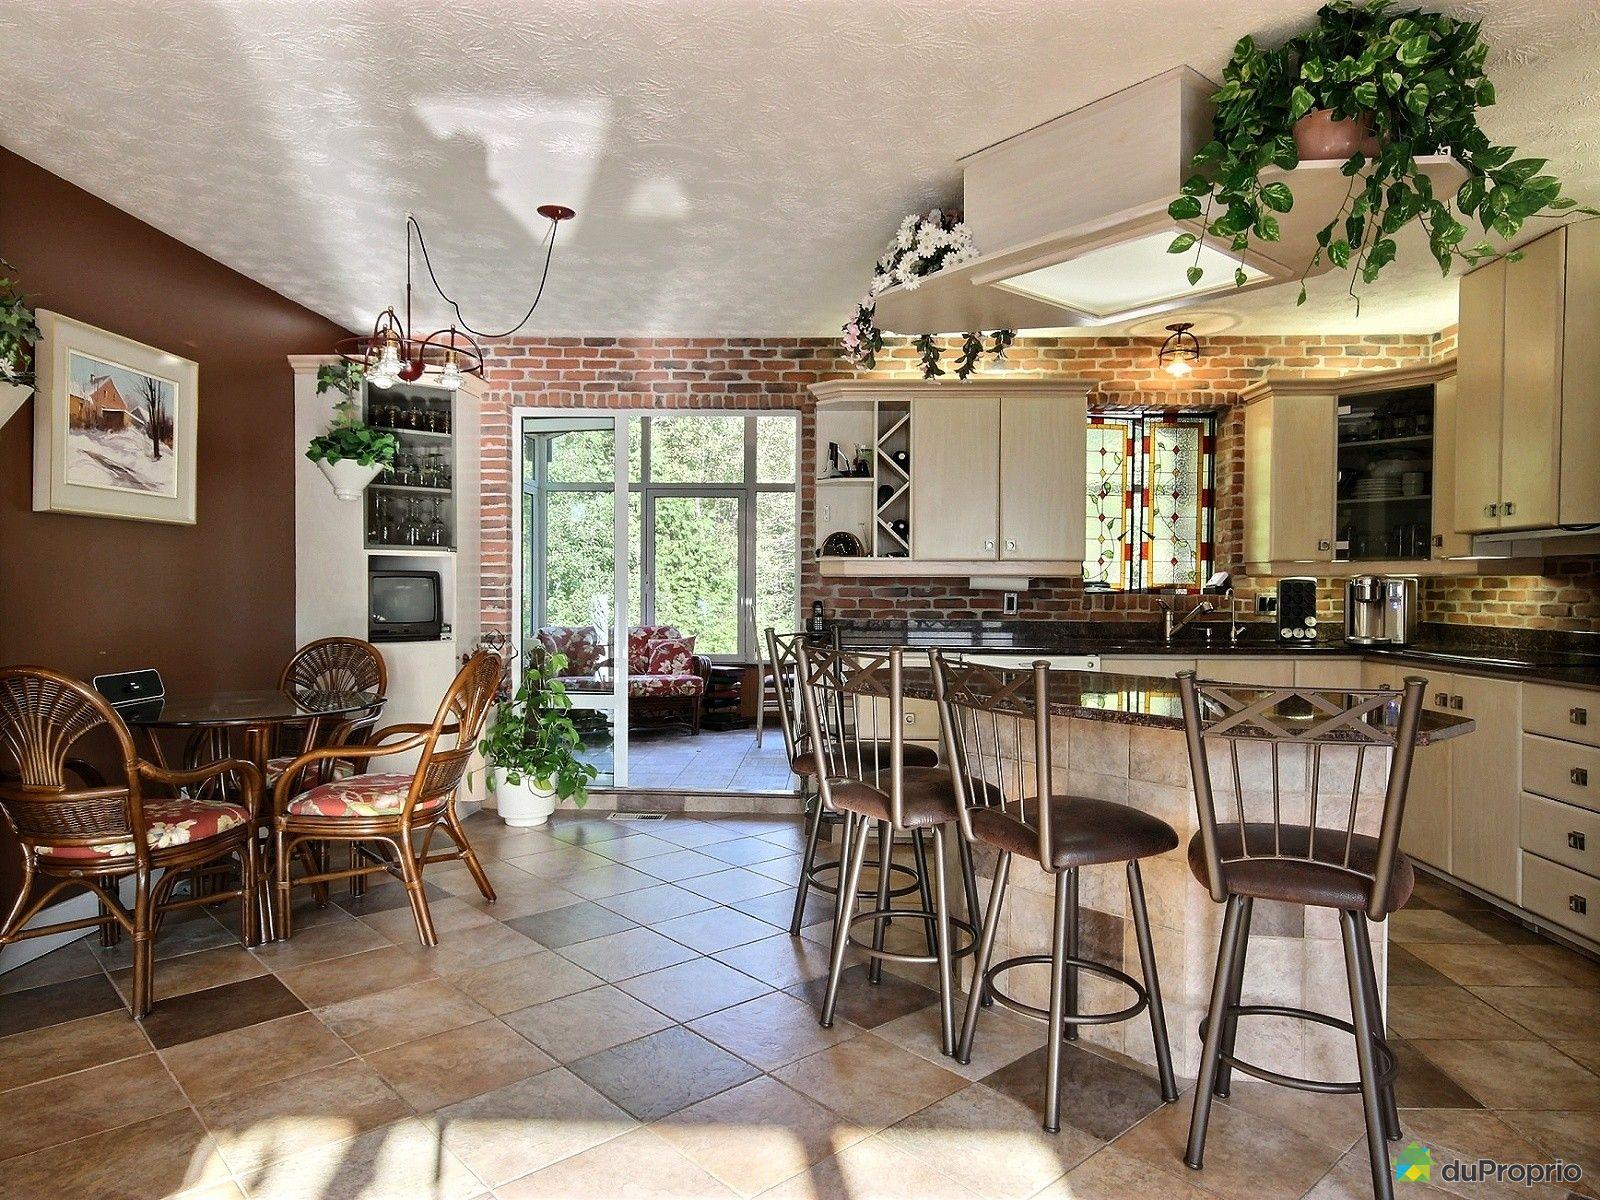 maison vendu la guadeloupe immobilier qu bec duproprio 546824. Black Bedroom Furniture Sets. Home Design Ideas